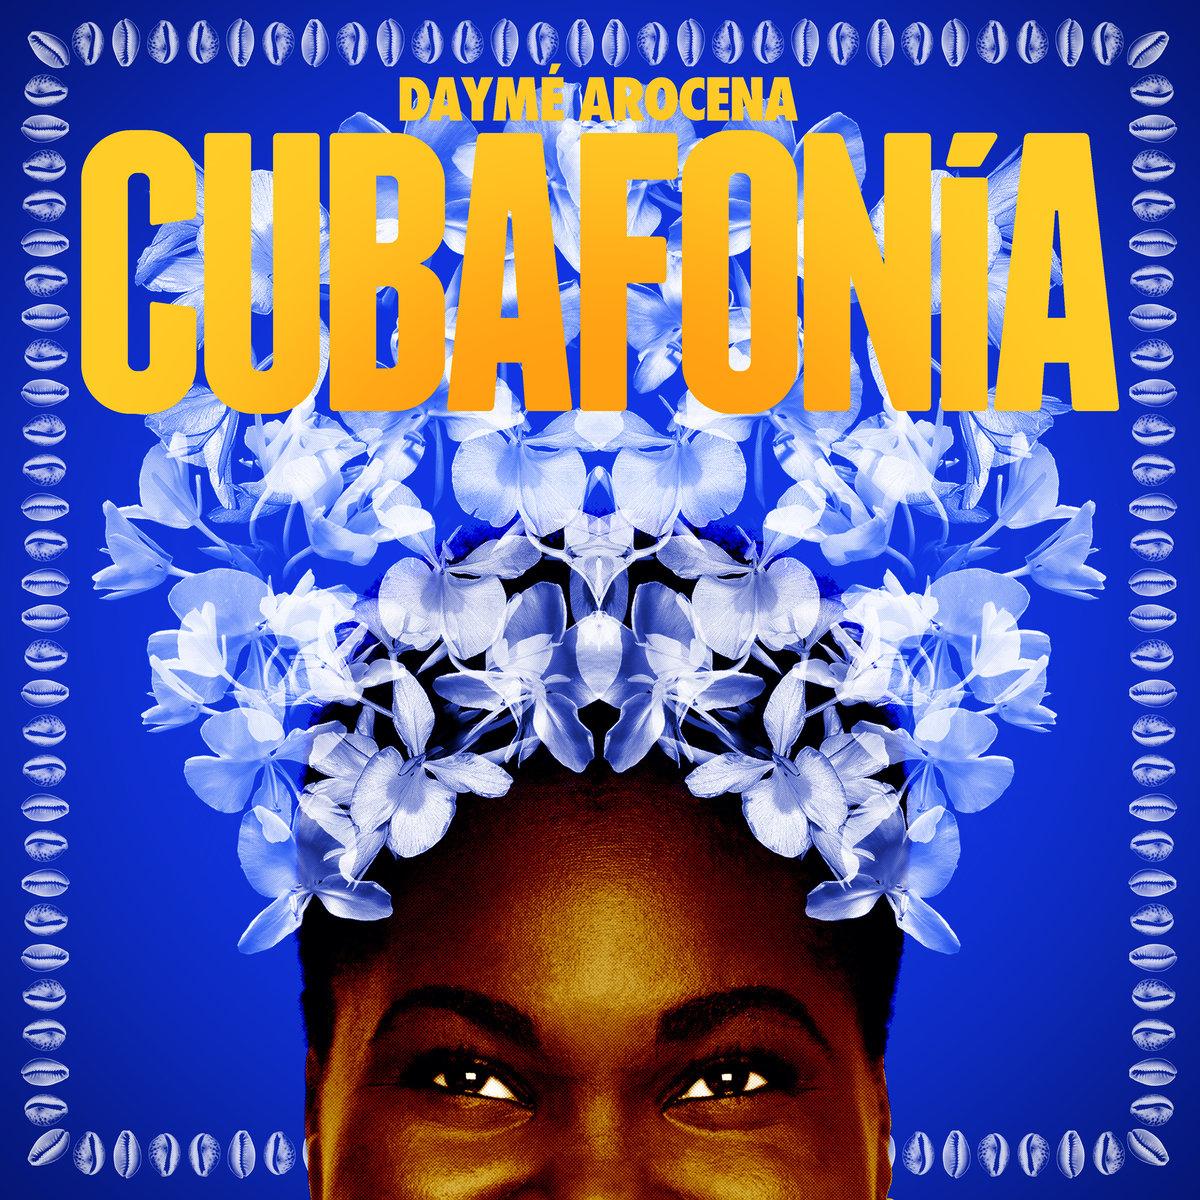 REVIEW: Daymé Arocena - Cubafonía